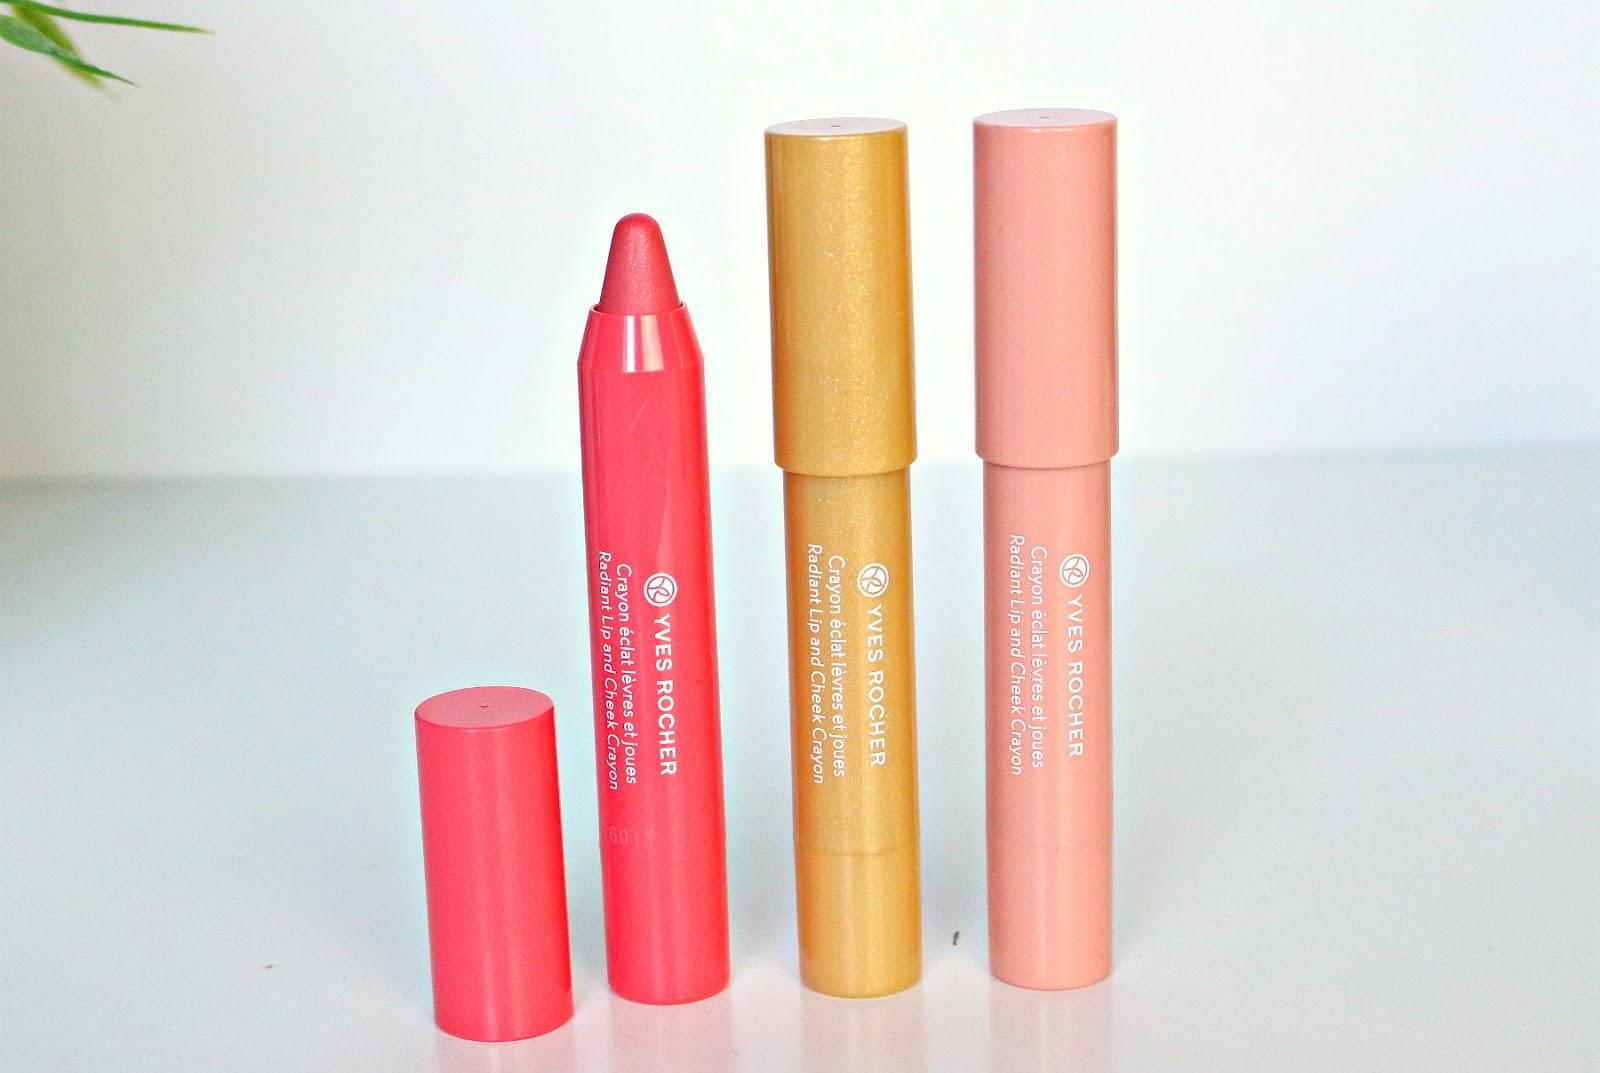 Yves Rocher Glossy Lip & Cheek potloden